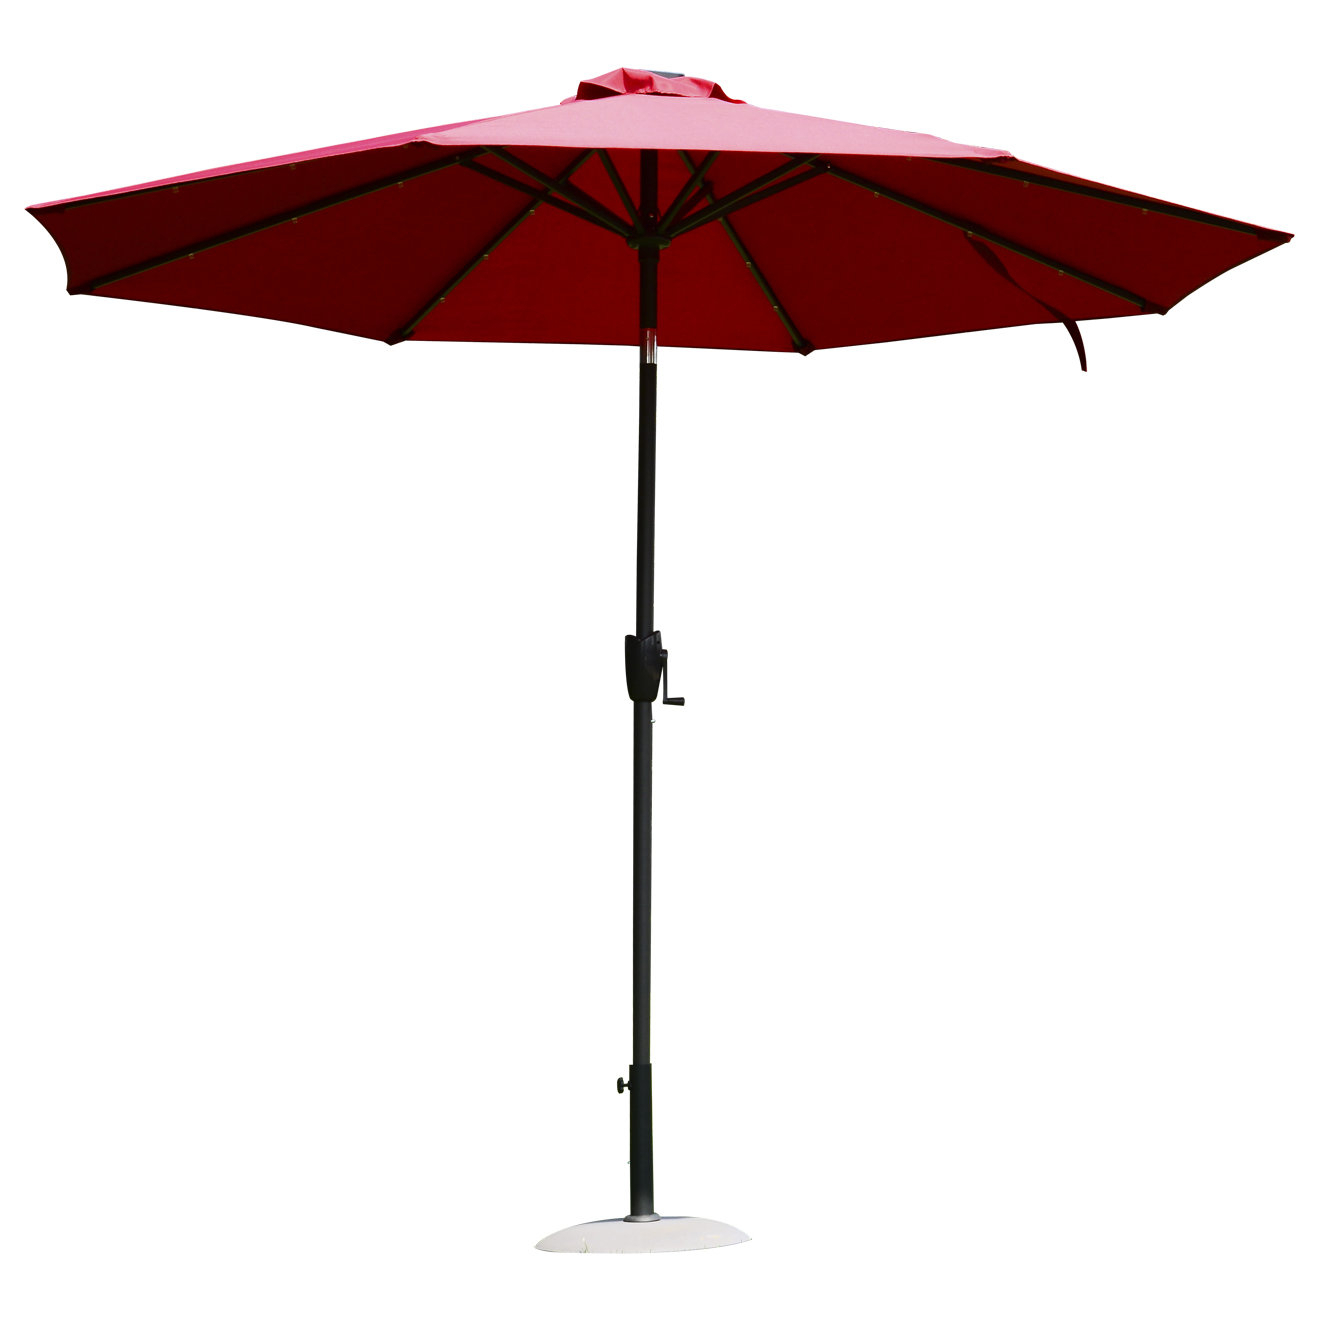 Chagnon 9' Market Umbrella Throughout Trendy Annabelle Market Umbrellas (View 10 of 20)